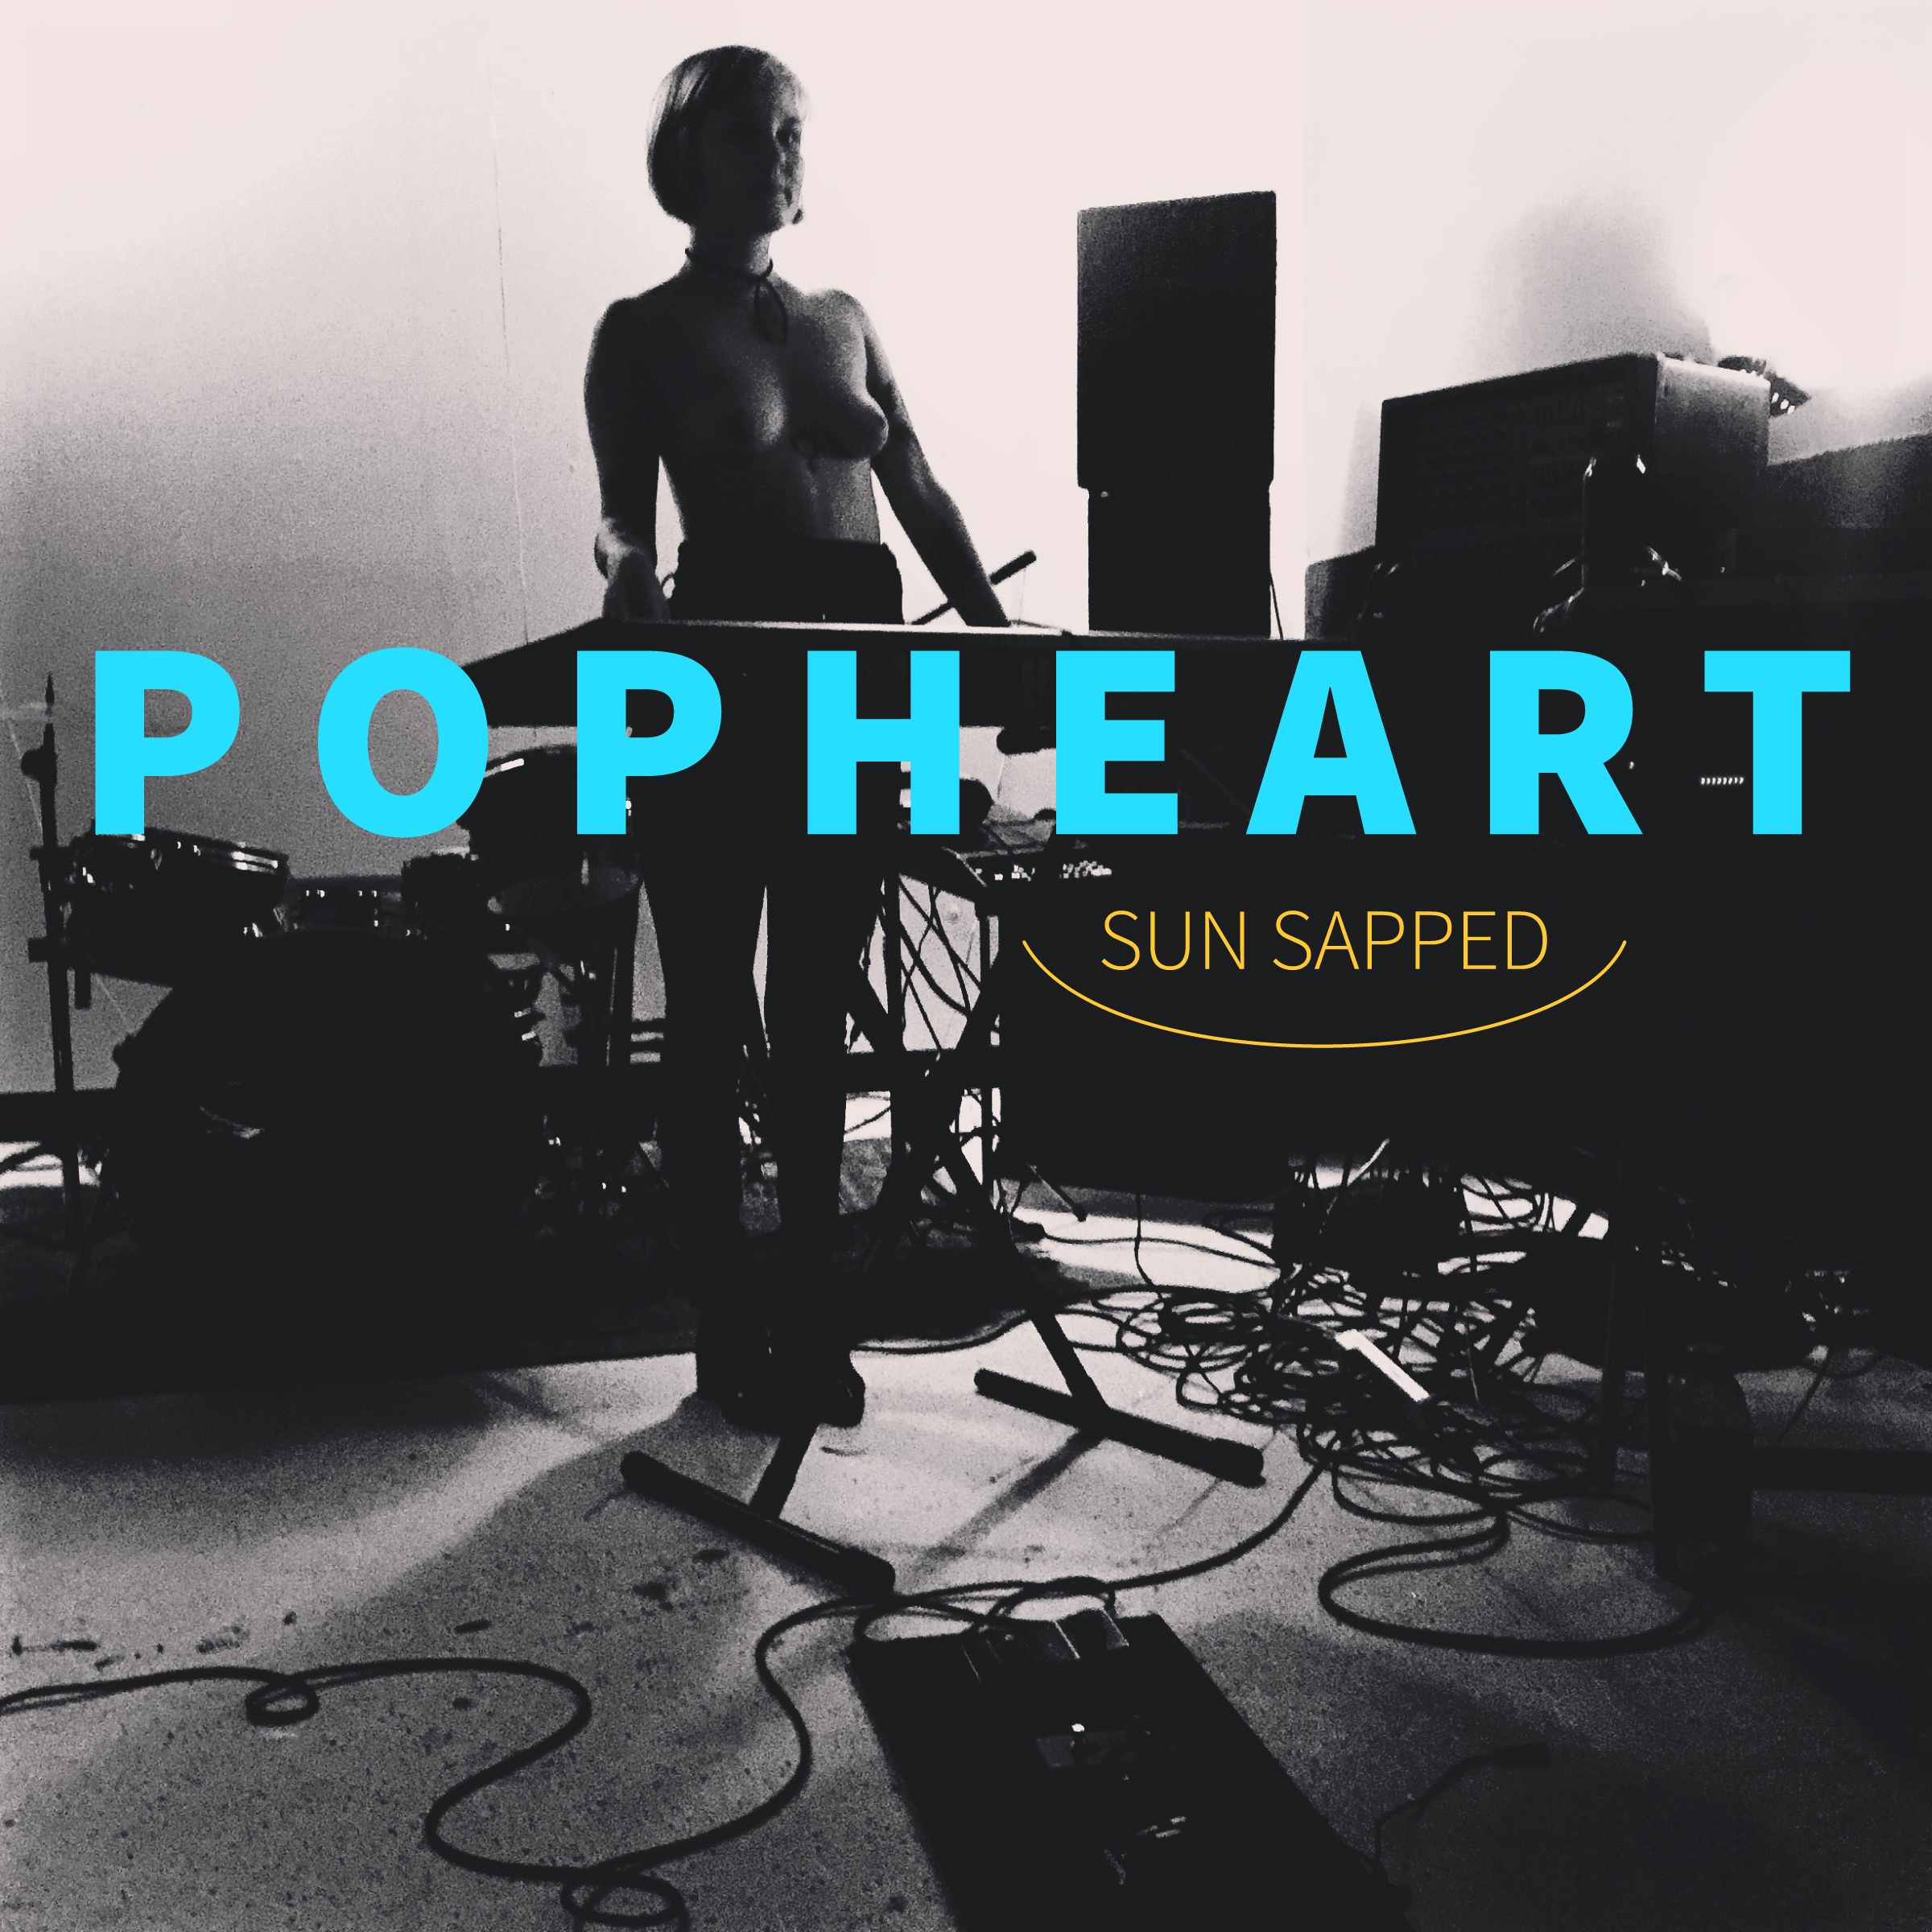 POPHEART - Kuyama Drama/Sun Sapped 7